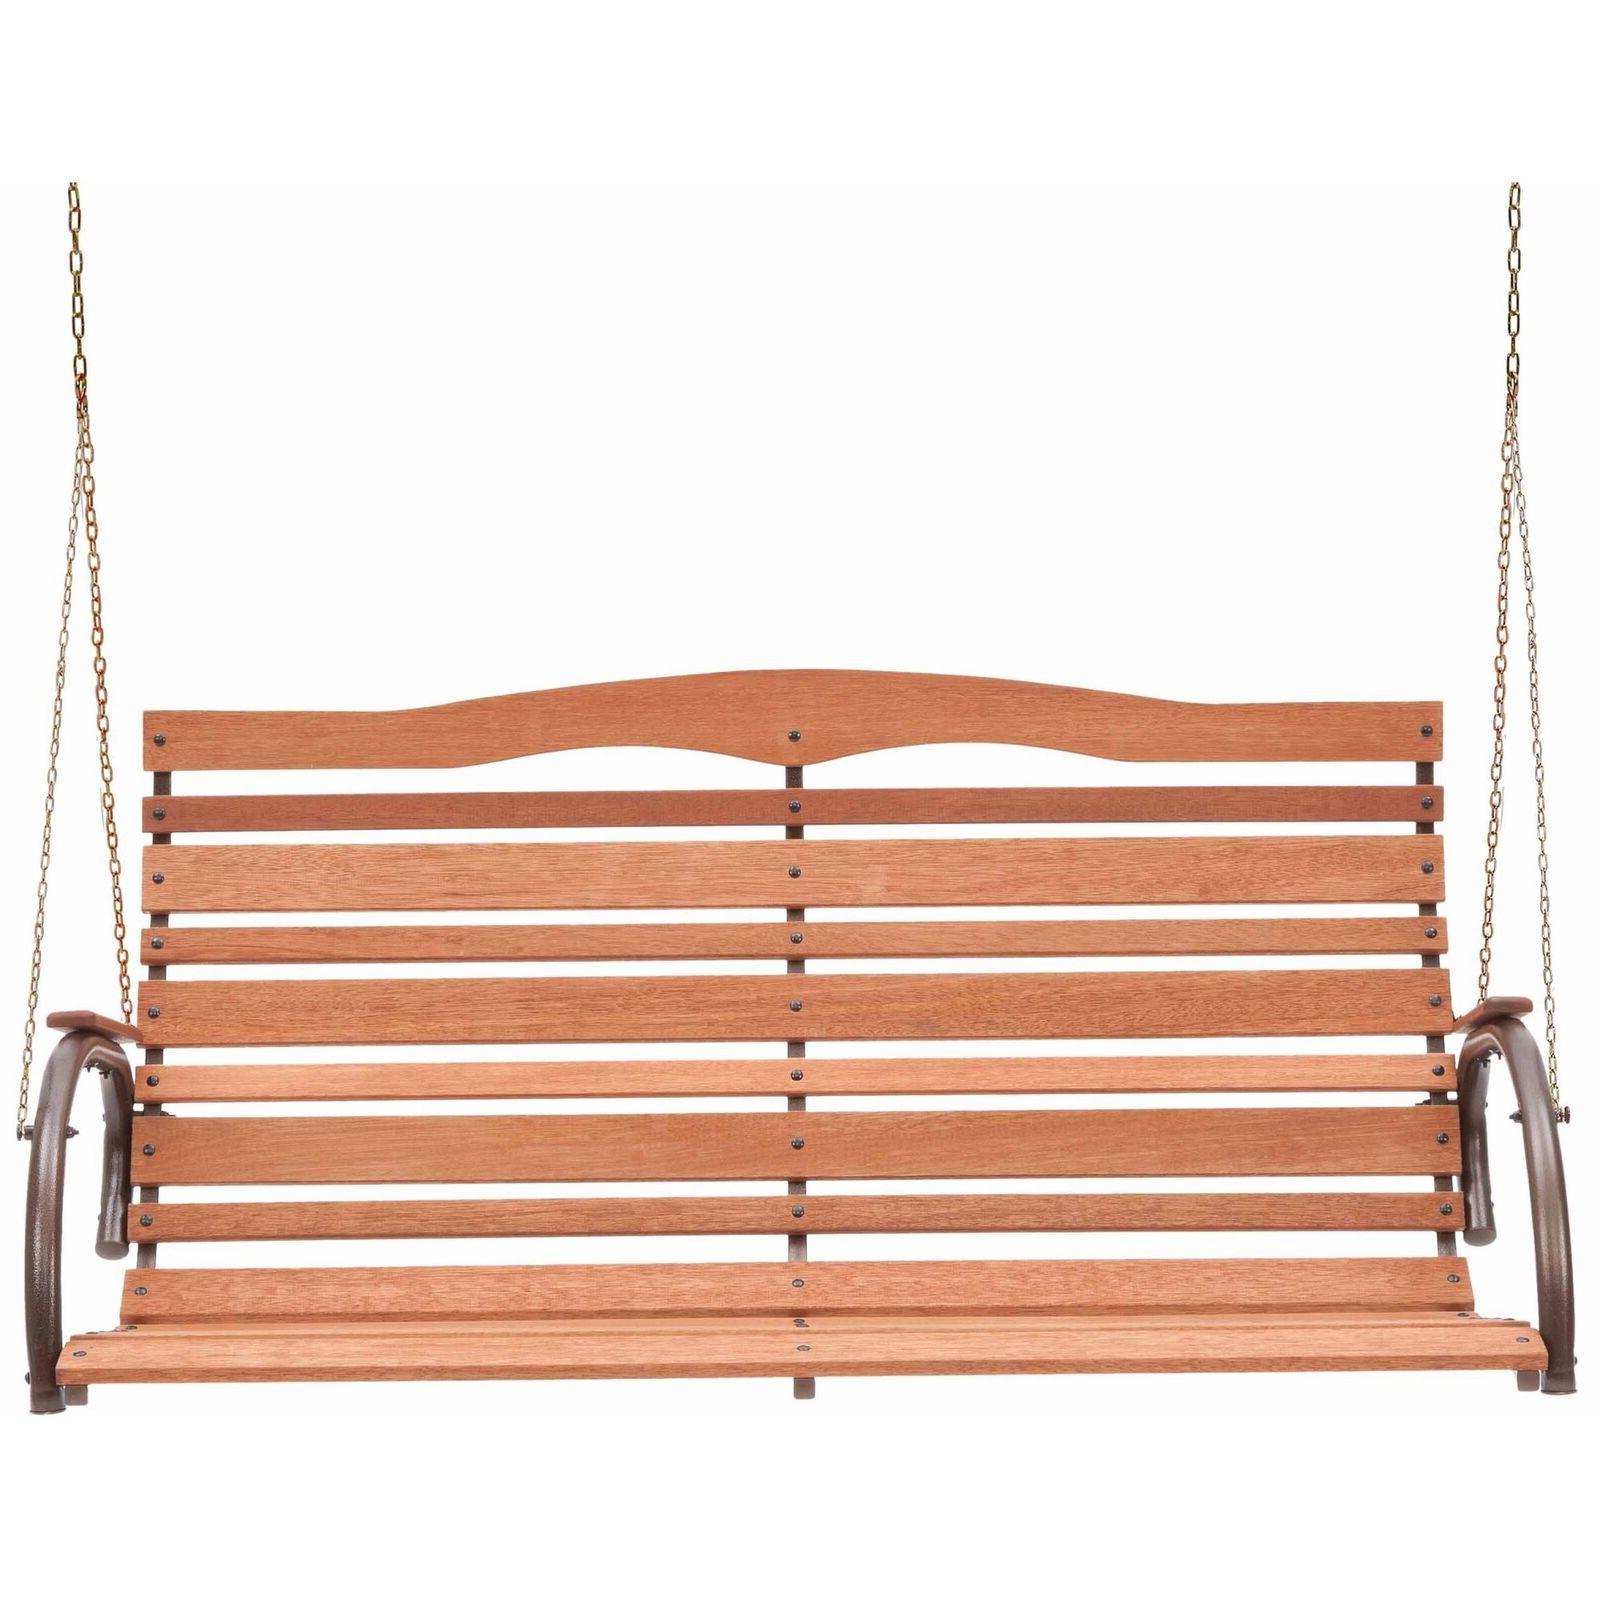 Porch Swings Sale Solid Wood Kit Loveseat 4 Foot Deck Patio